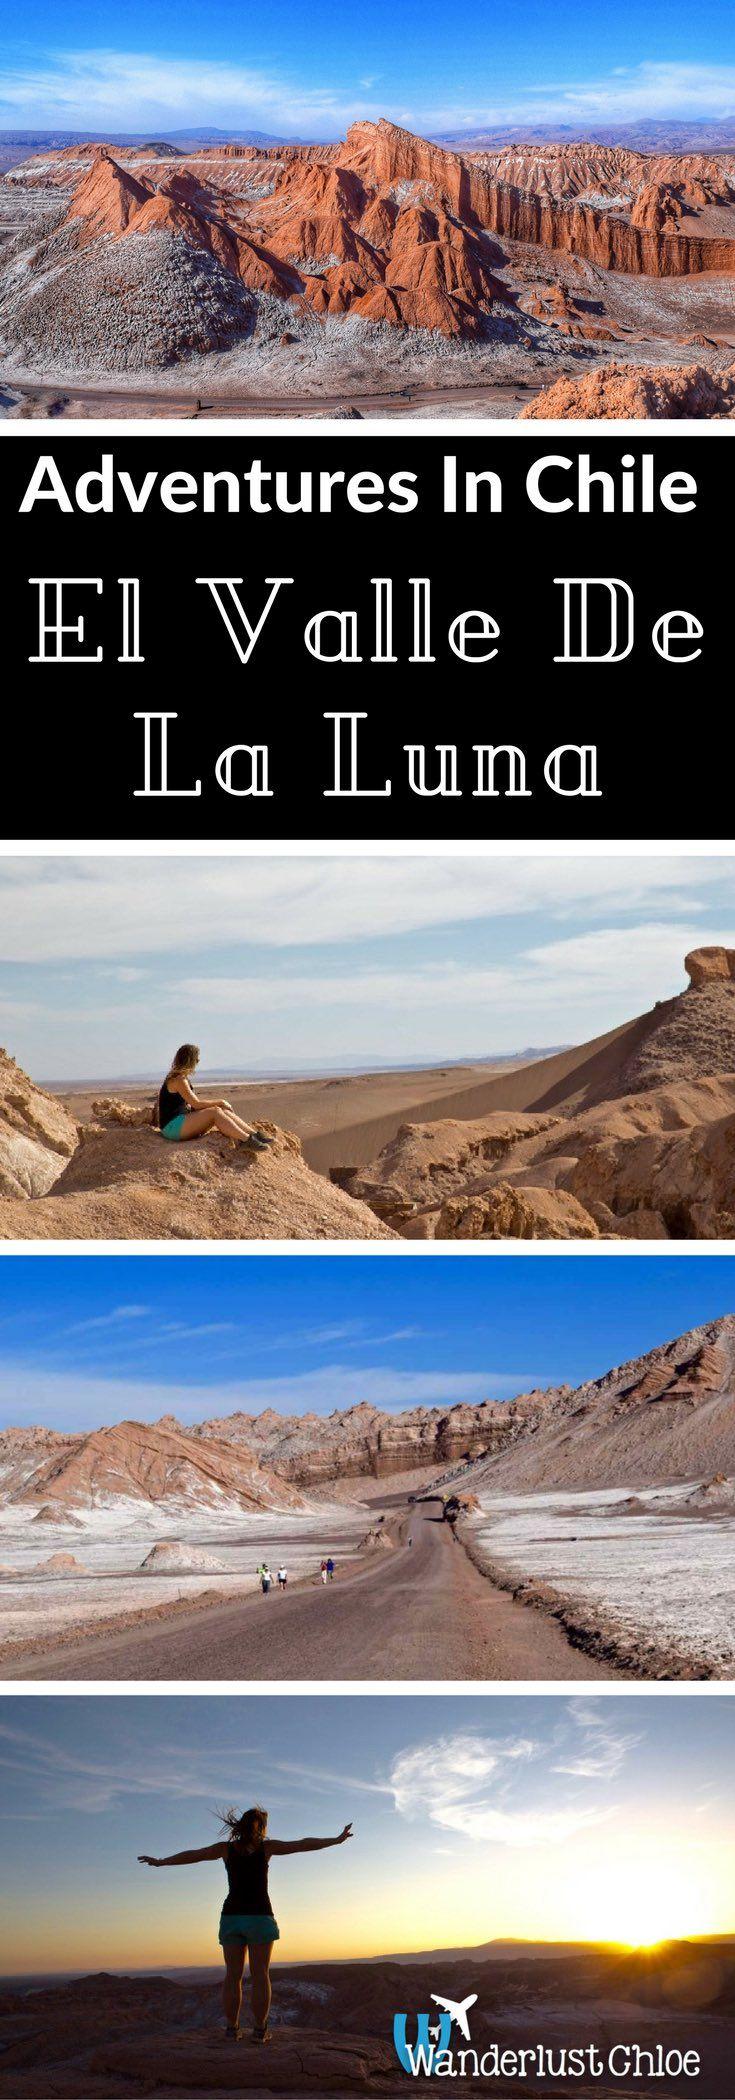 Adventures in El Valle De La Luna. Rugged lunar landscapes, sand dunes,deepvalleys and salt caves. Welcome to Chile'sAtacama Desert – the driest place on earth.